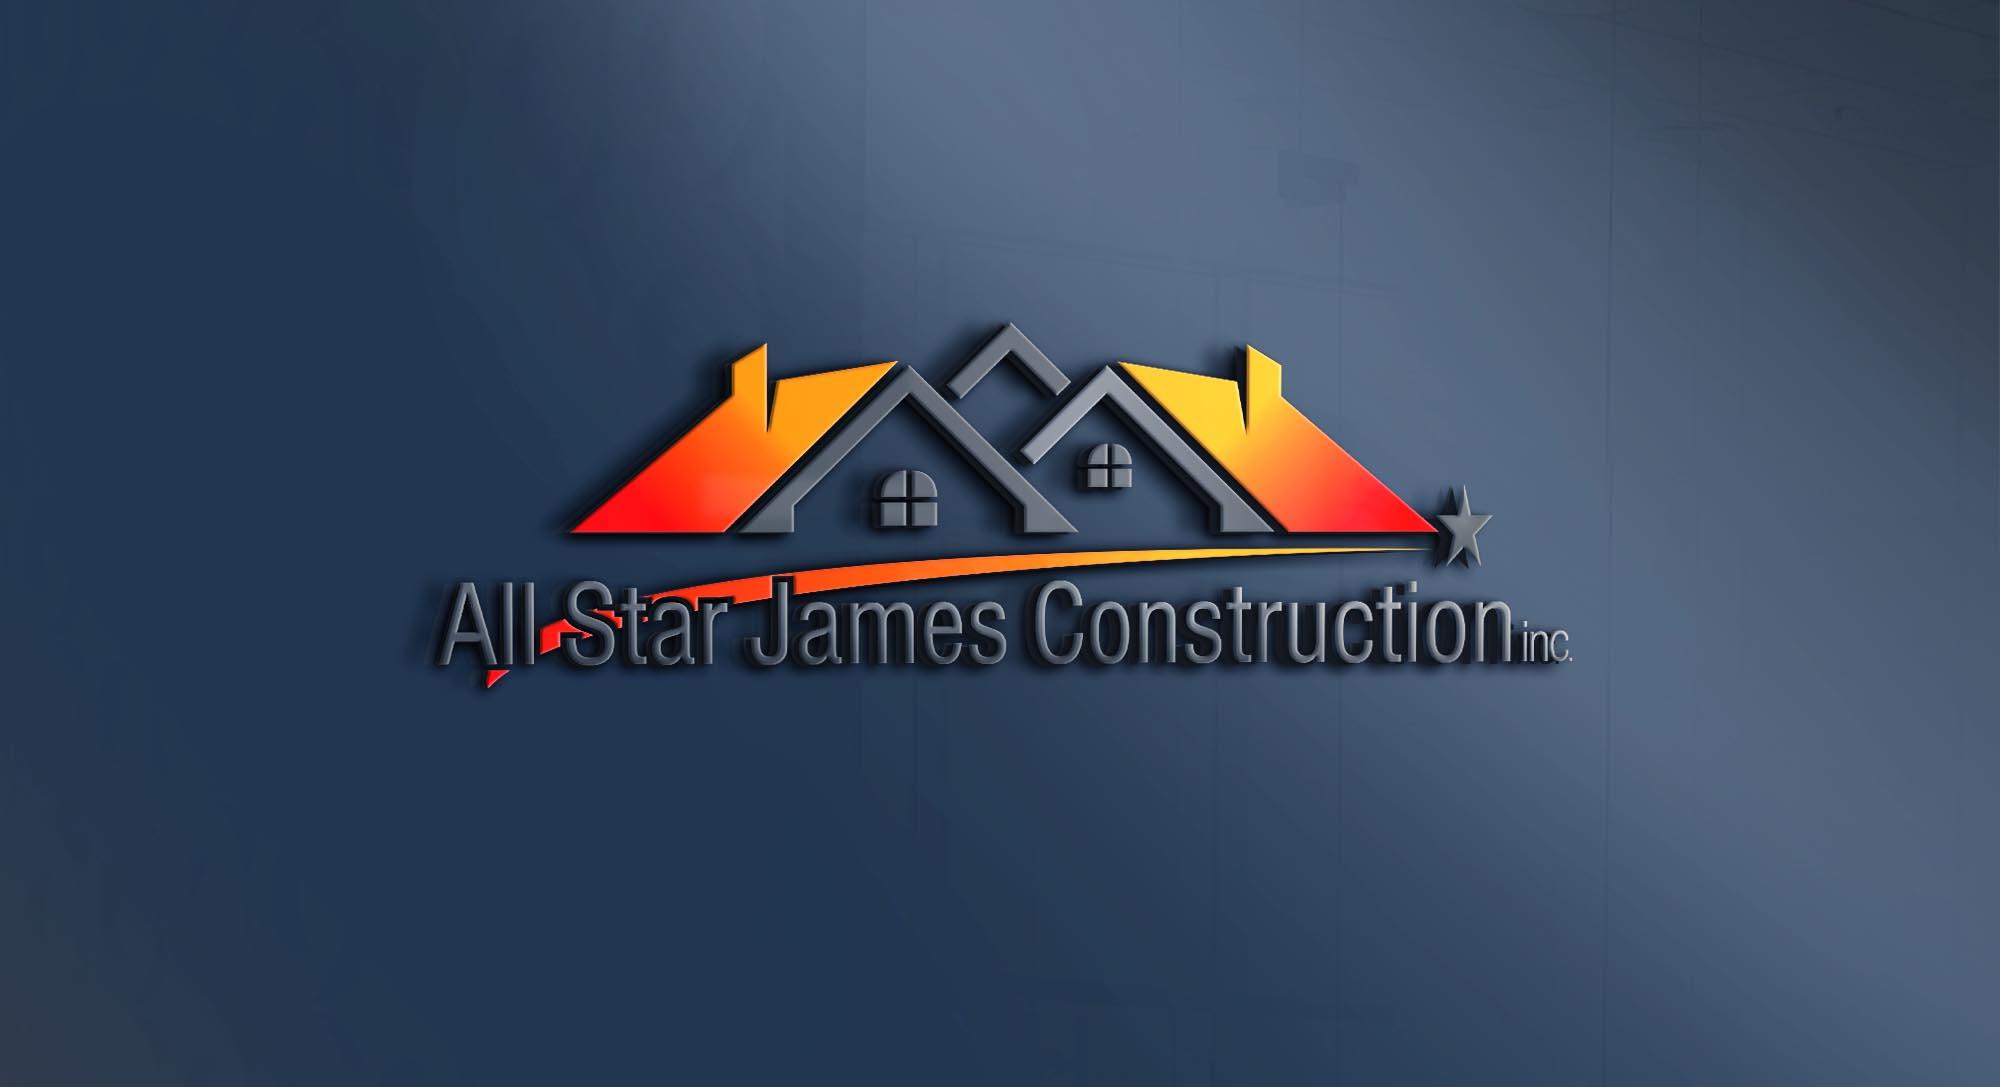 All Star James Construction Inc